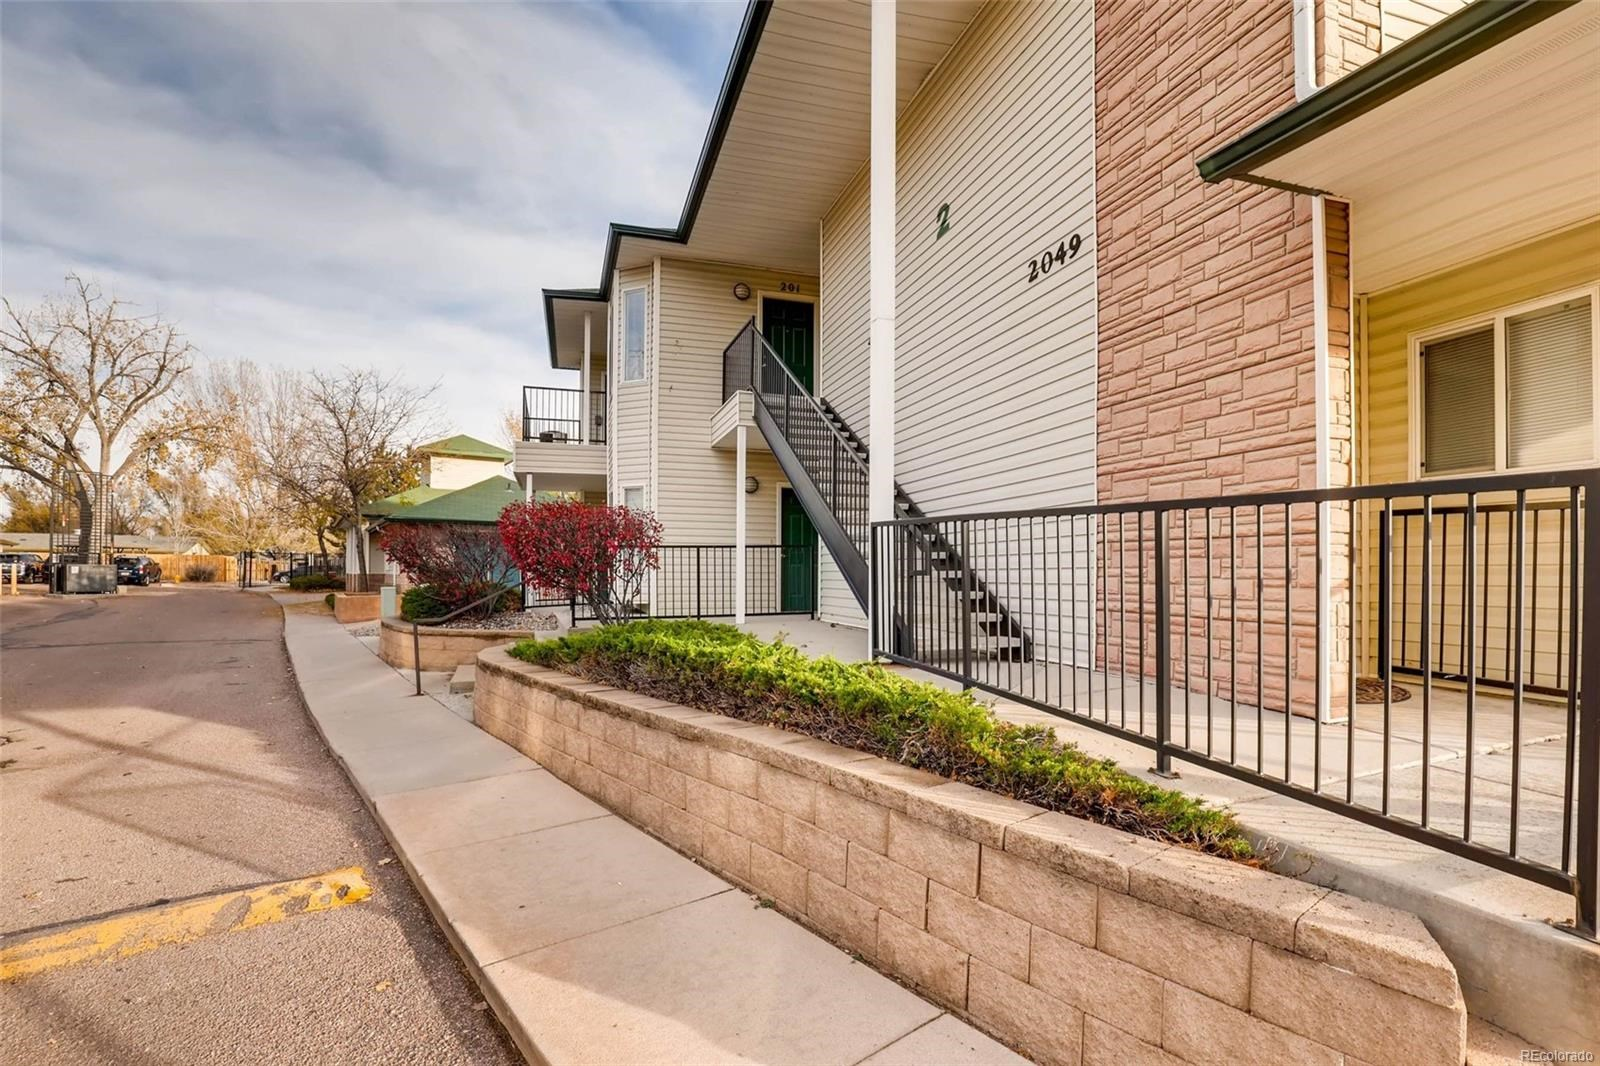 MLS# 9808696 - 2 - 2049 Legacy Ridge View, Colorado Springs, CO 80910